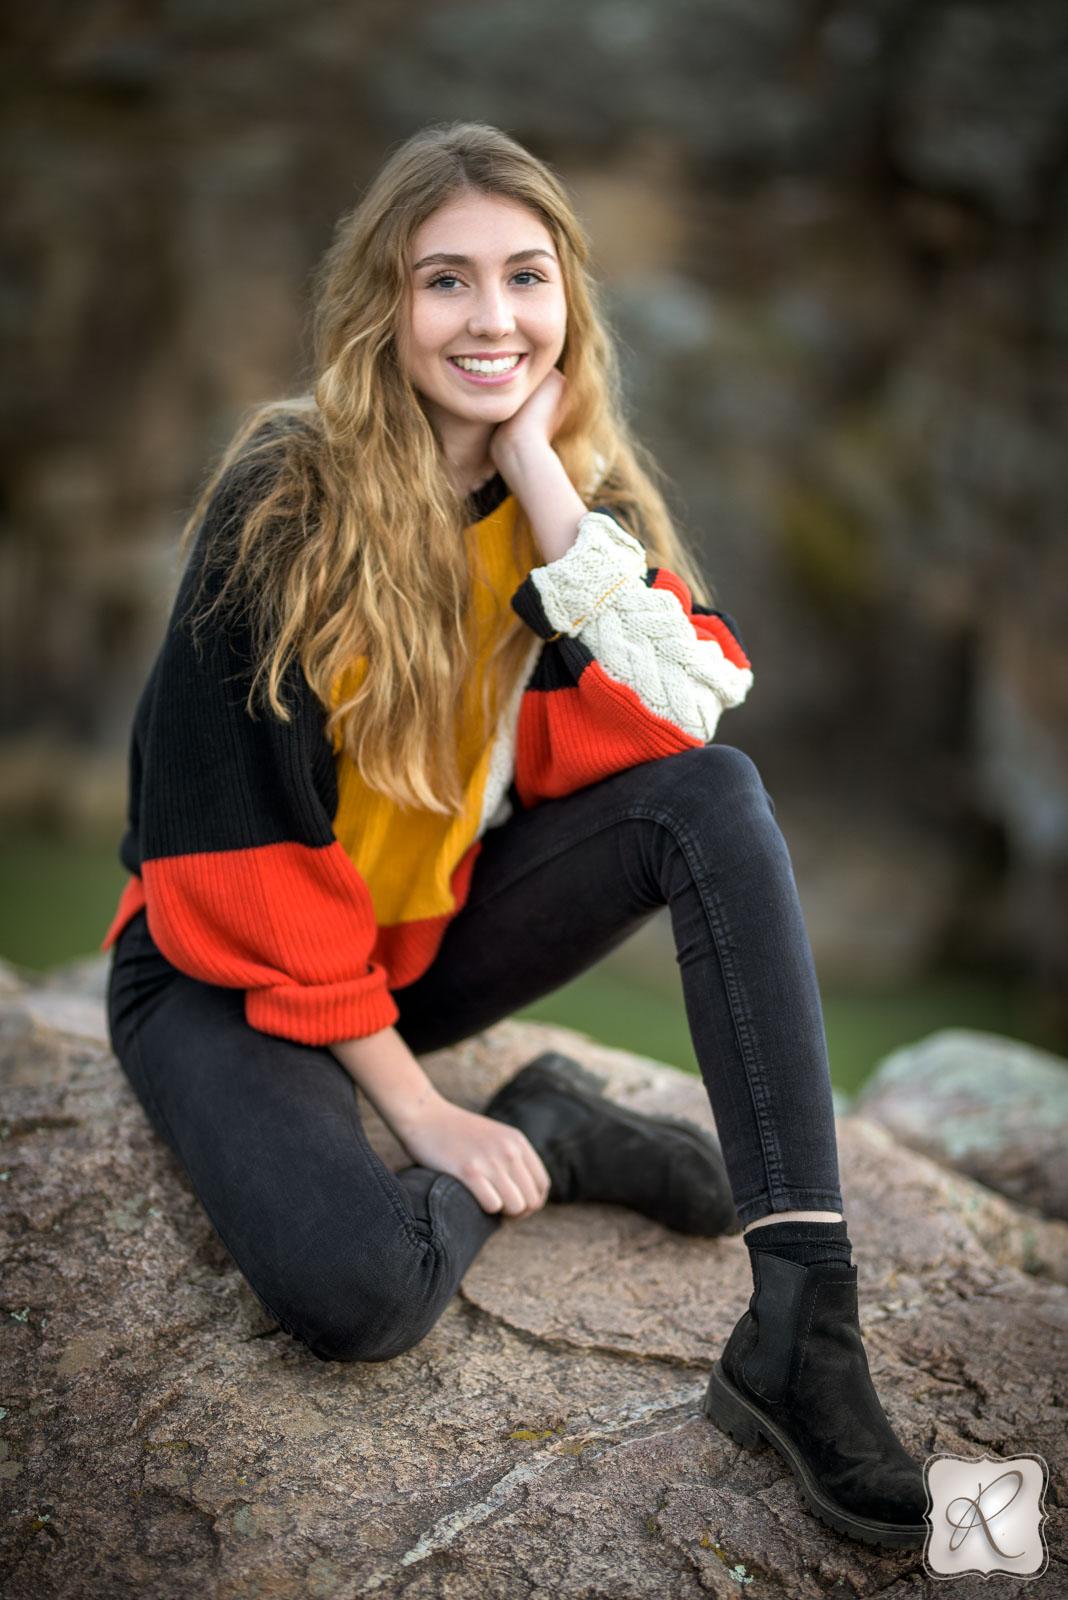 Allison Ragsdale Photography